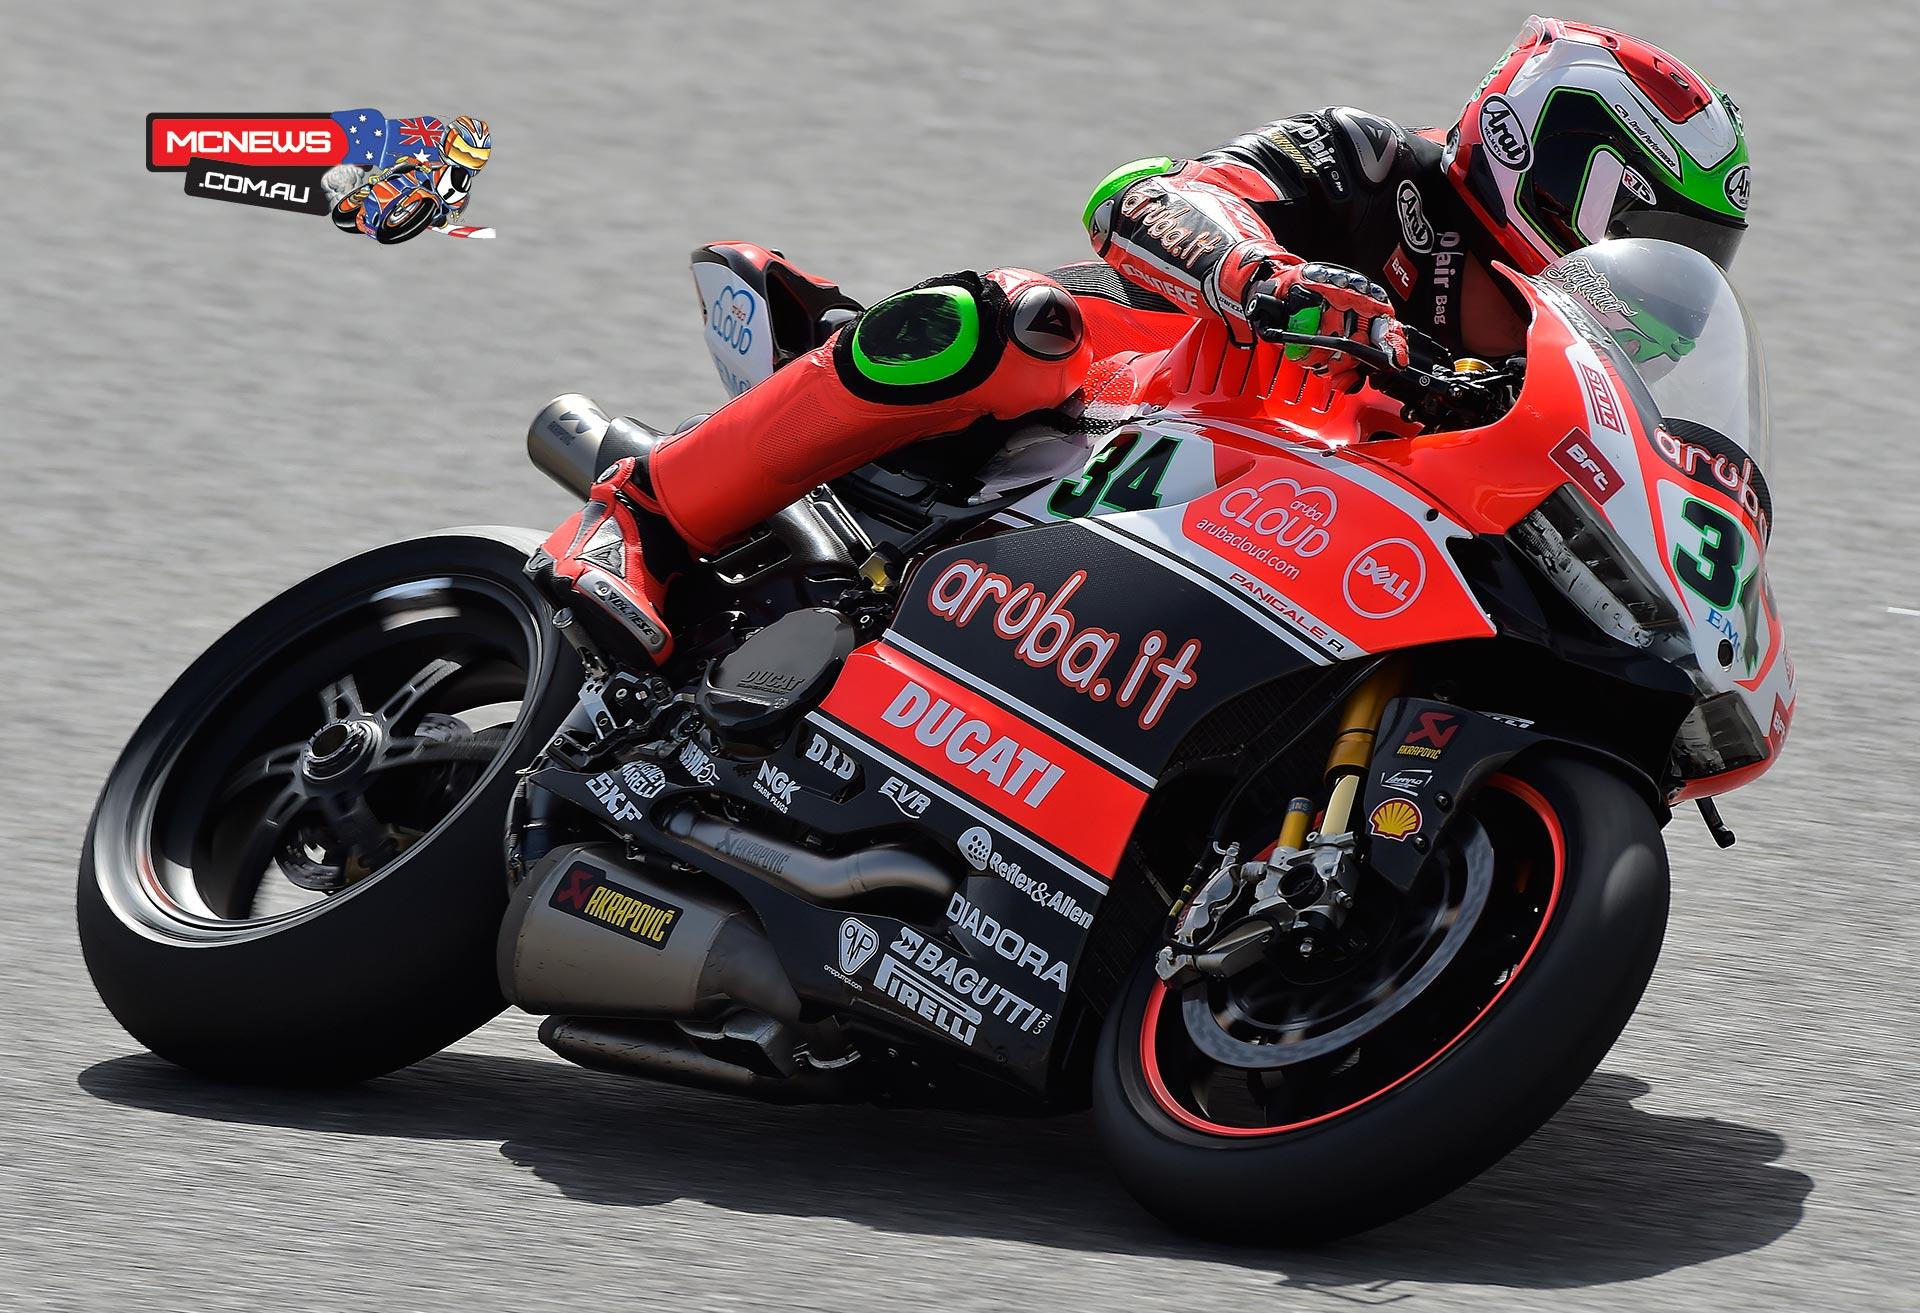 Davide Giugliano - (Aruba.it Racing - Ducati Superbike Team #34)